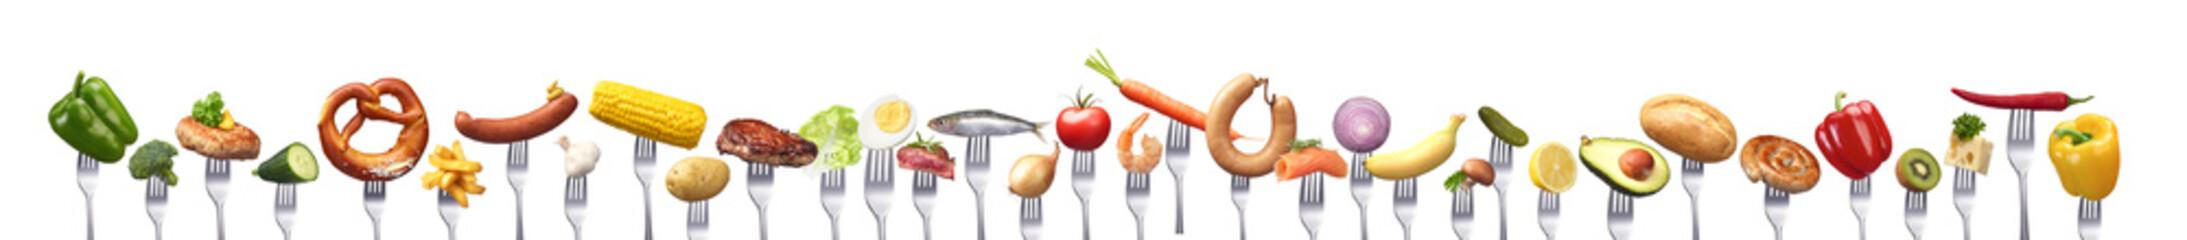 Große Gruppe verschiedener Lebensmitteln